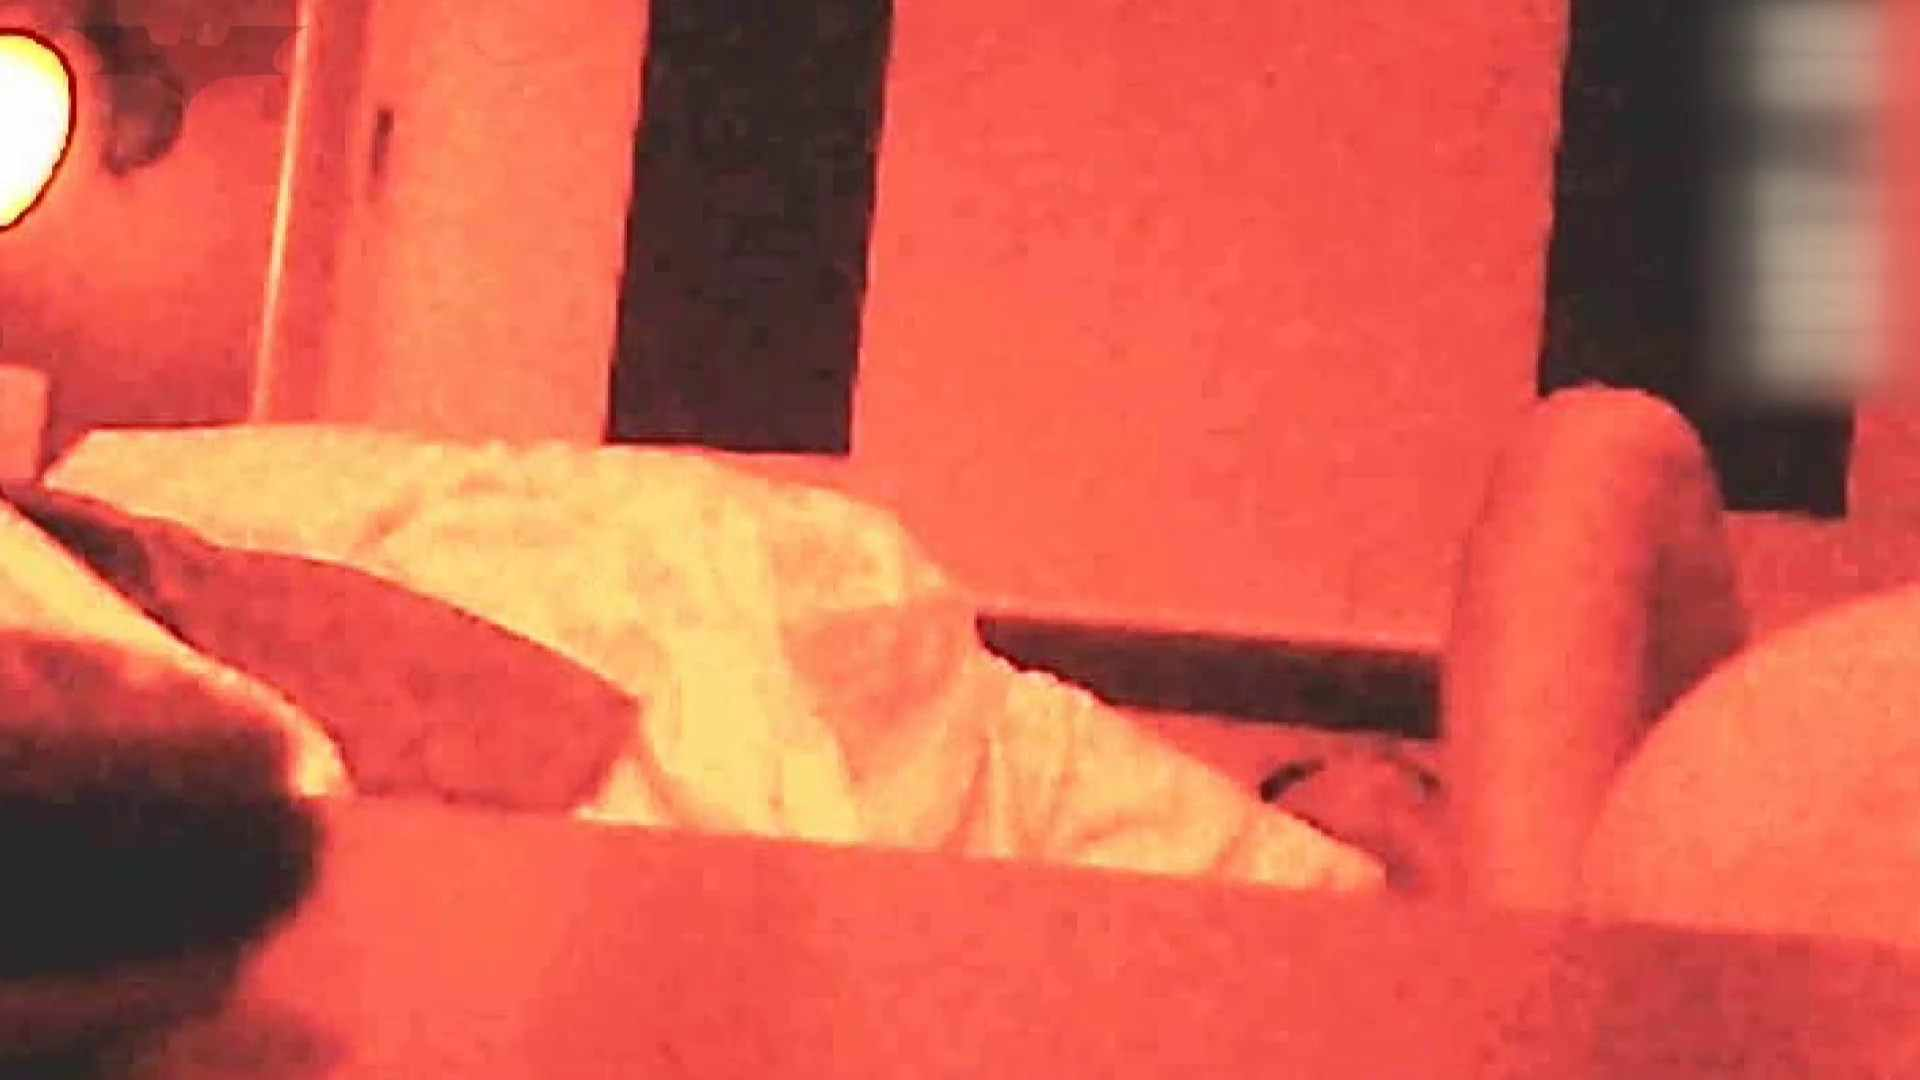 ▲2017_05位▲ 学園アイドル美人女子大生!❶4人厳選詰合せVol.49 人気作   女子大生  113画像 8